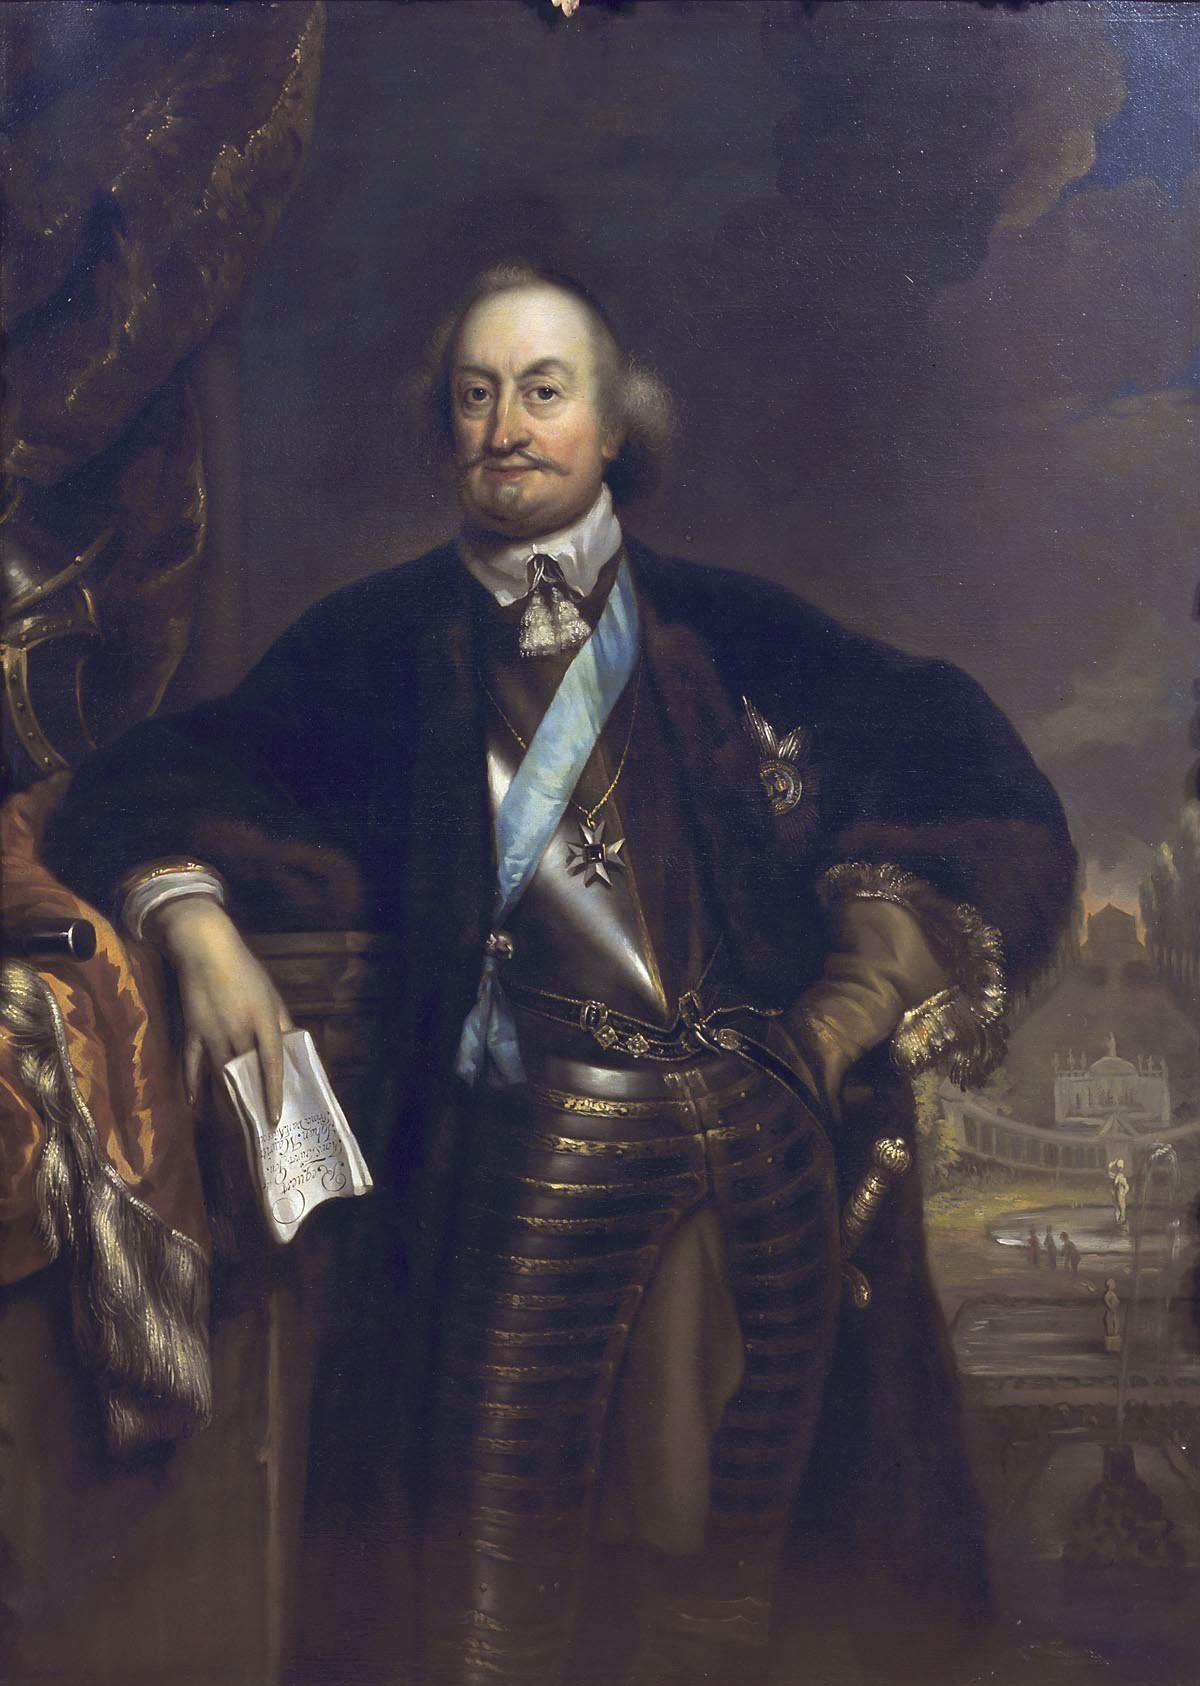 Johan Maurits (1604-1679), Count of Nassau-Siegen, founder of th